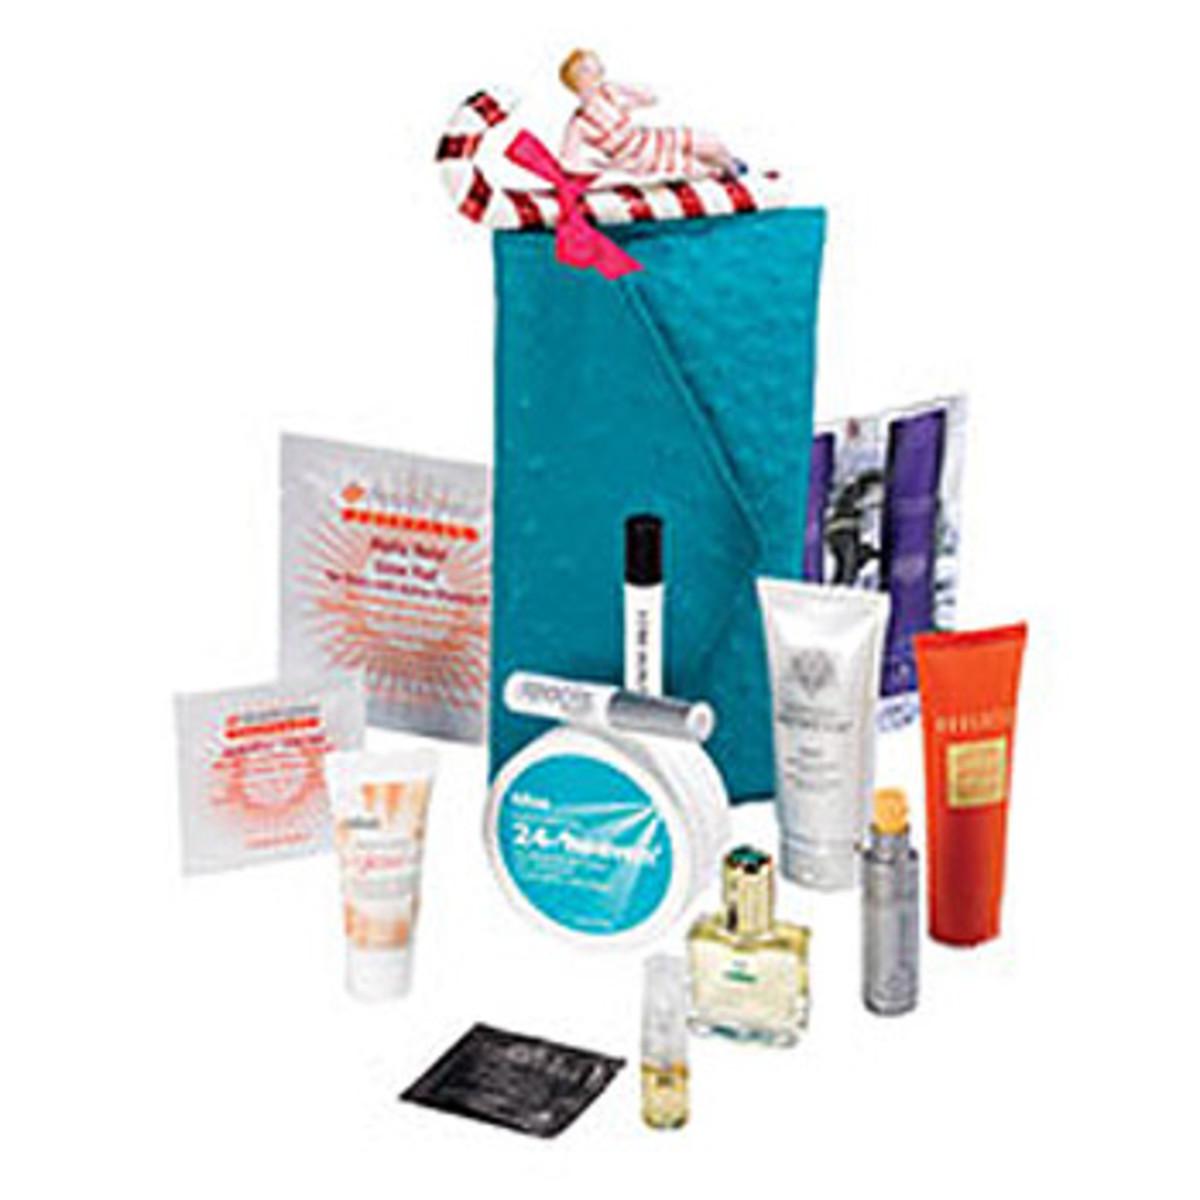 Bliss Holiday Beauty Bag